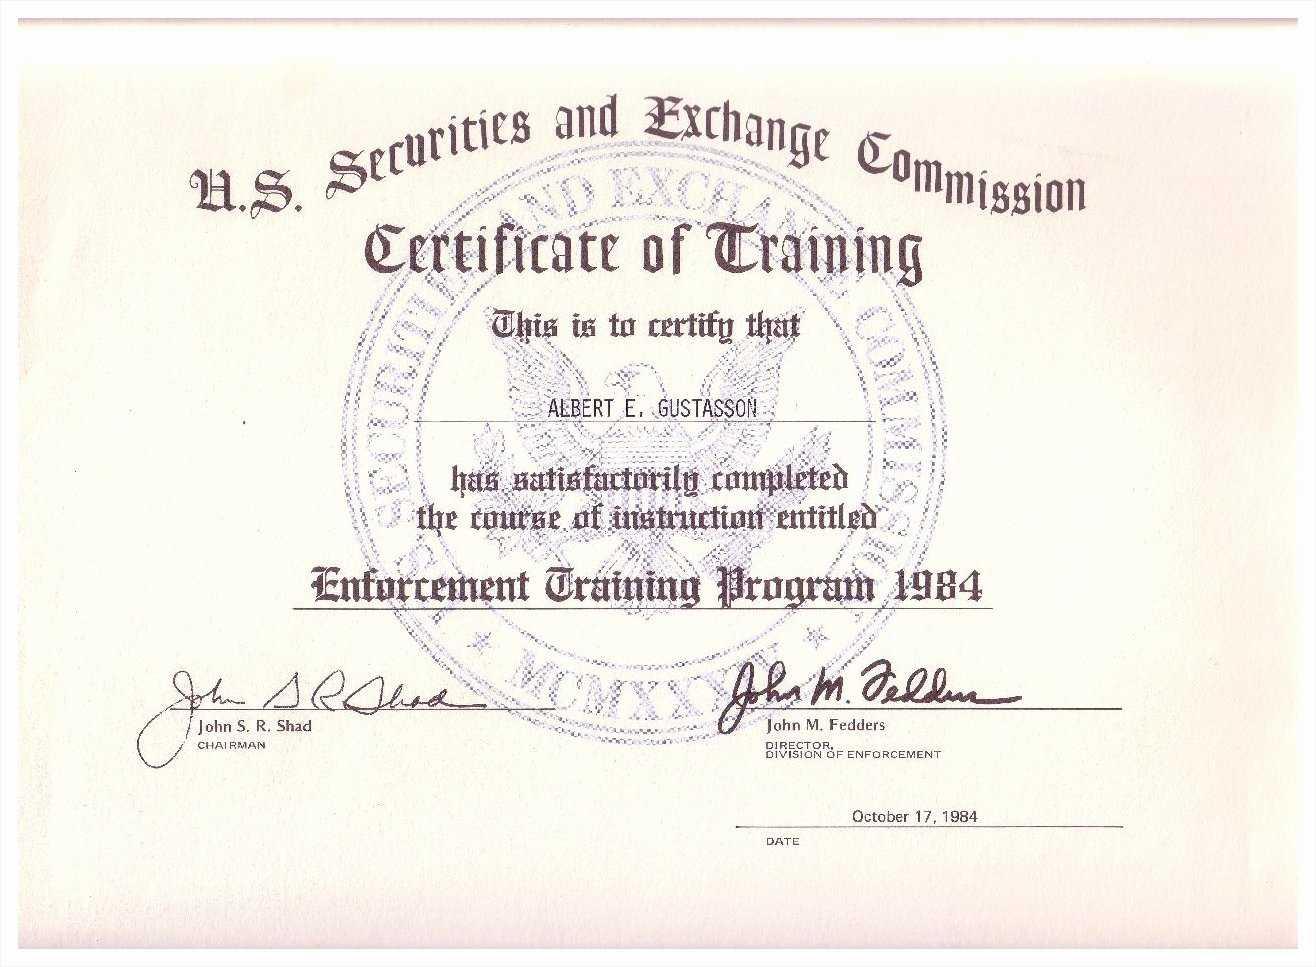 Army Certificate Of Training Template - Karan.ald2014 Inside Army Certificate Of Achievement Template